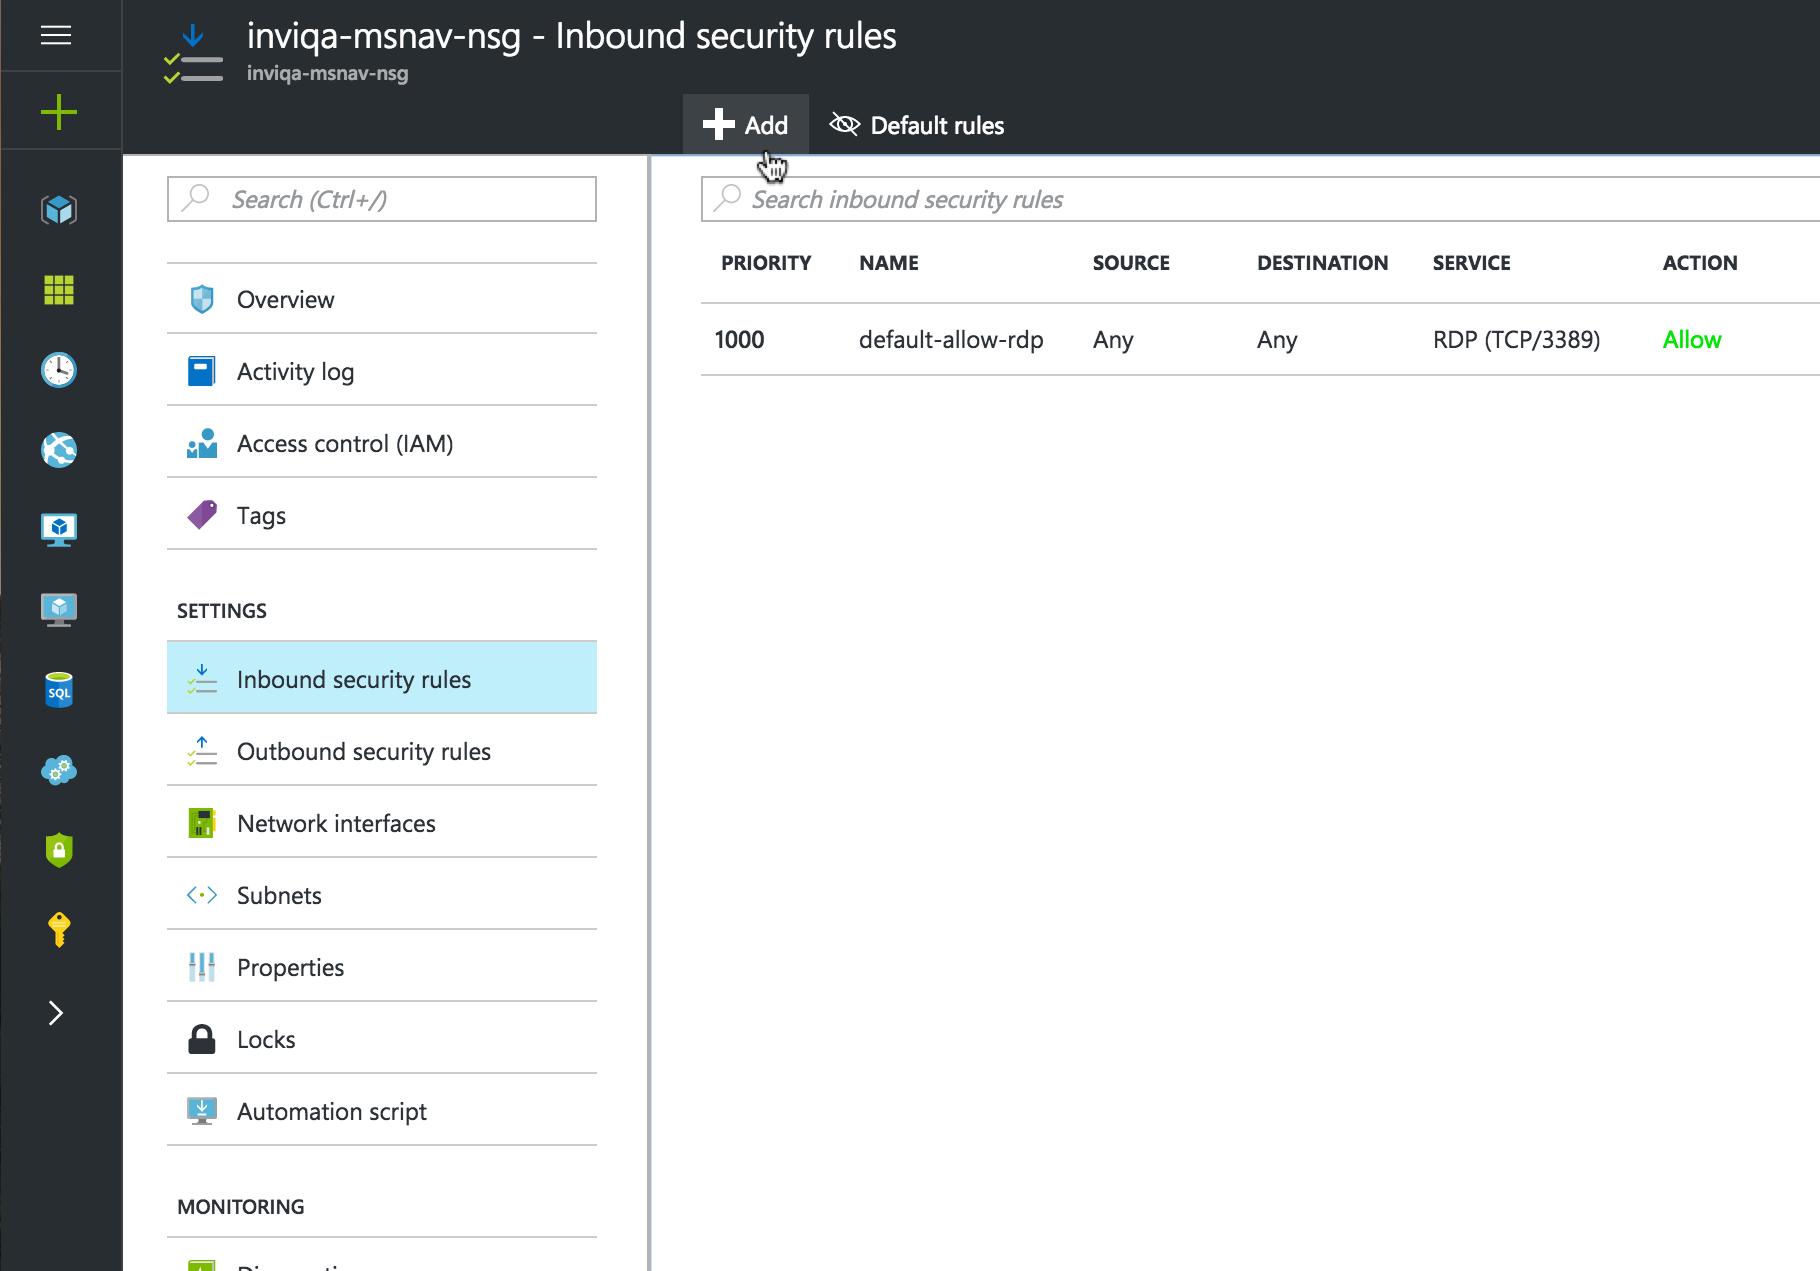 Screenshot of adding firewall rules